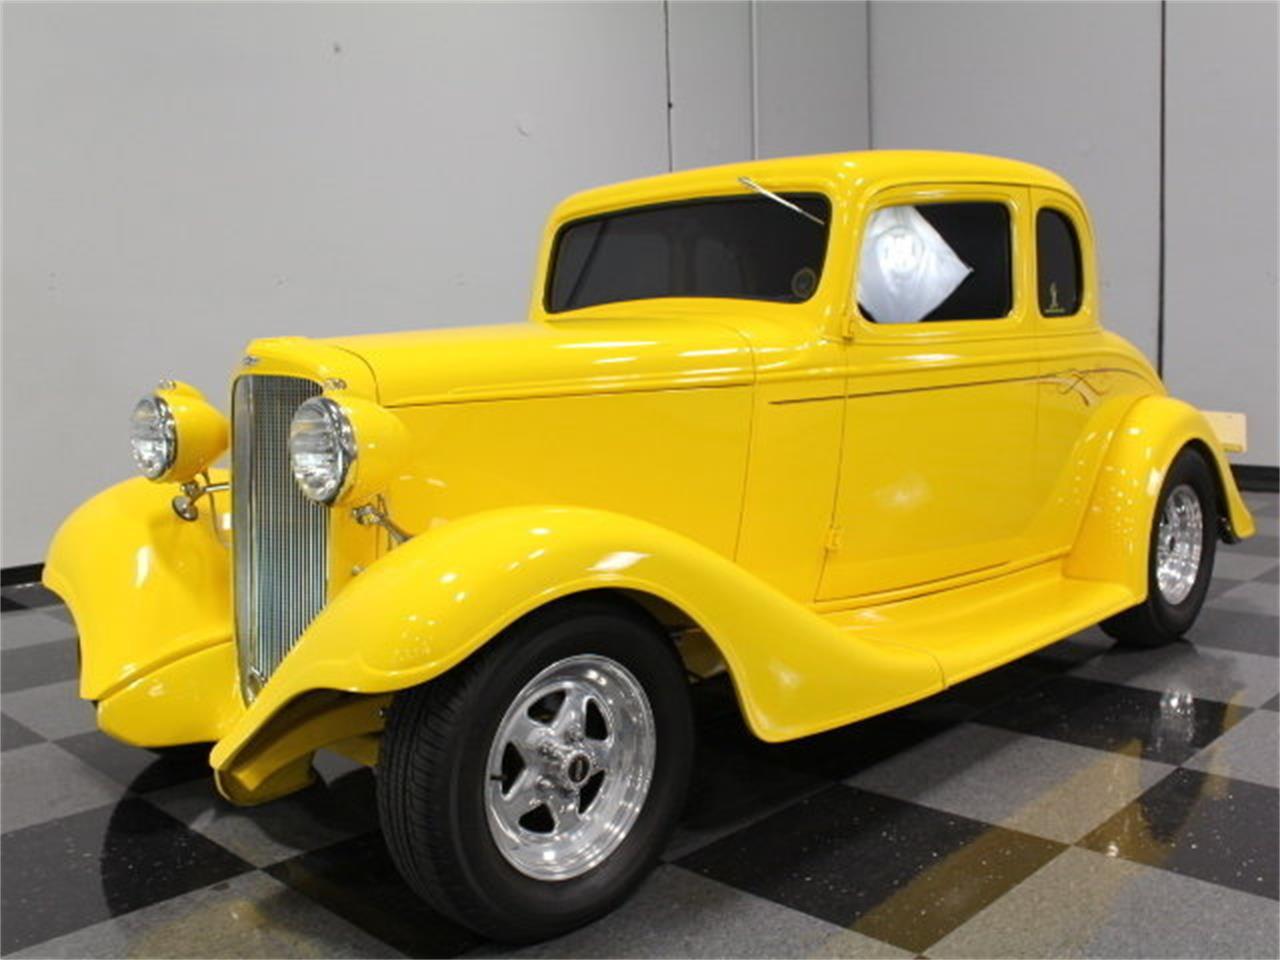 Phenomenal 1933 Chevrolet 5 Window Coupe For Sale Classiccars Com Spiritservingveterans Wood Chair Design Ideas Spiritservingveteransorg